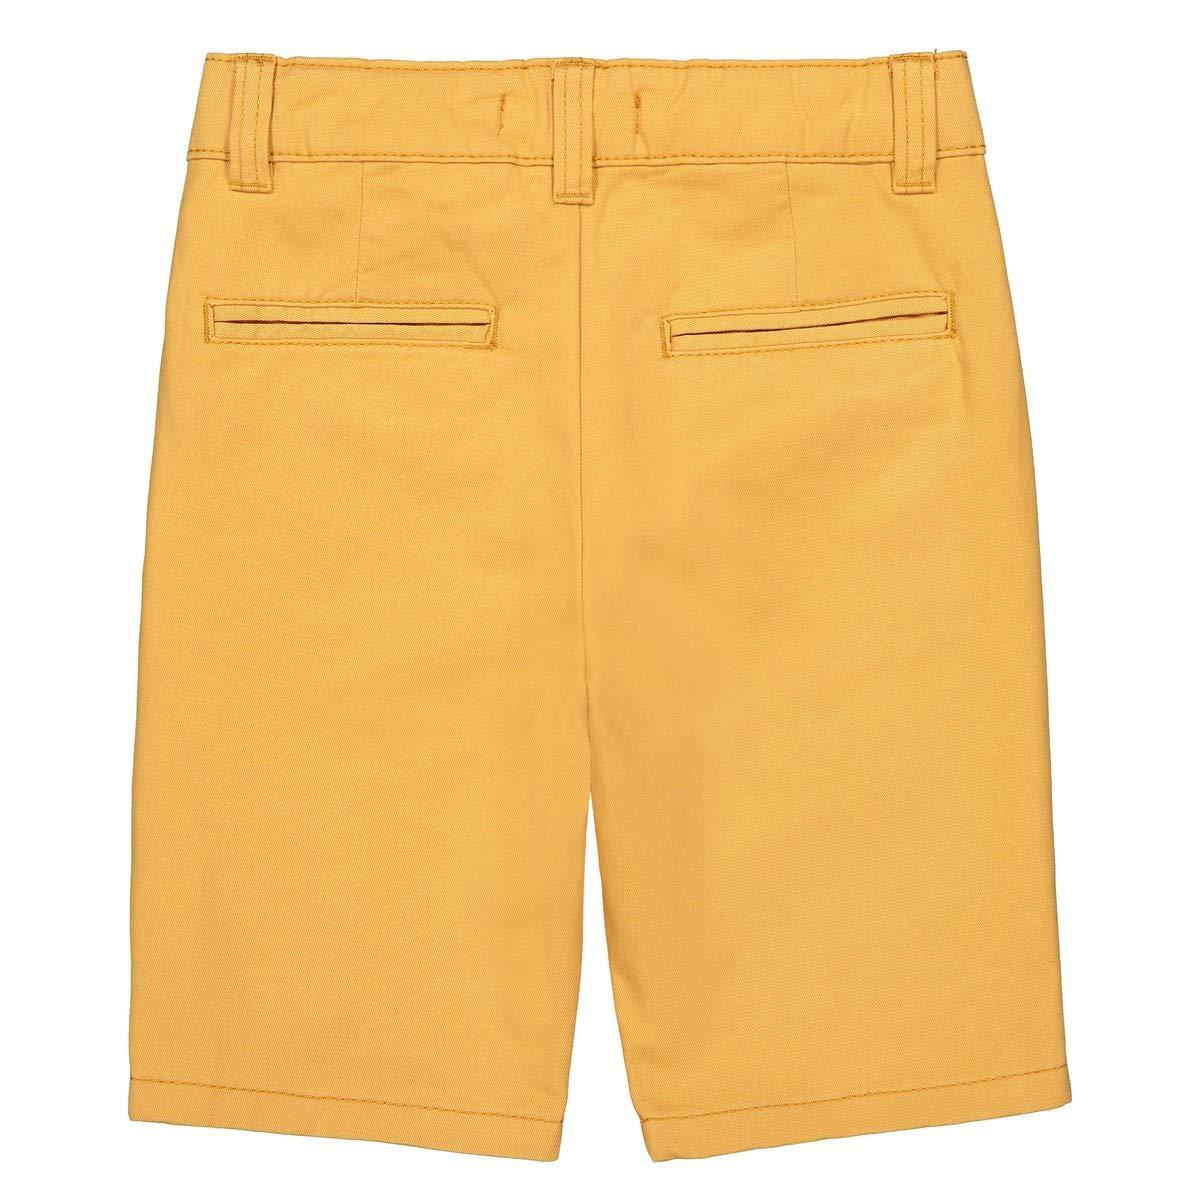 La Redoute Collections Big Boys Plain Bermuda Shorts 3-12 Years